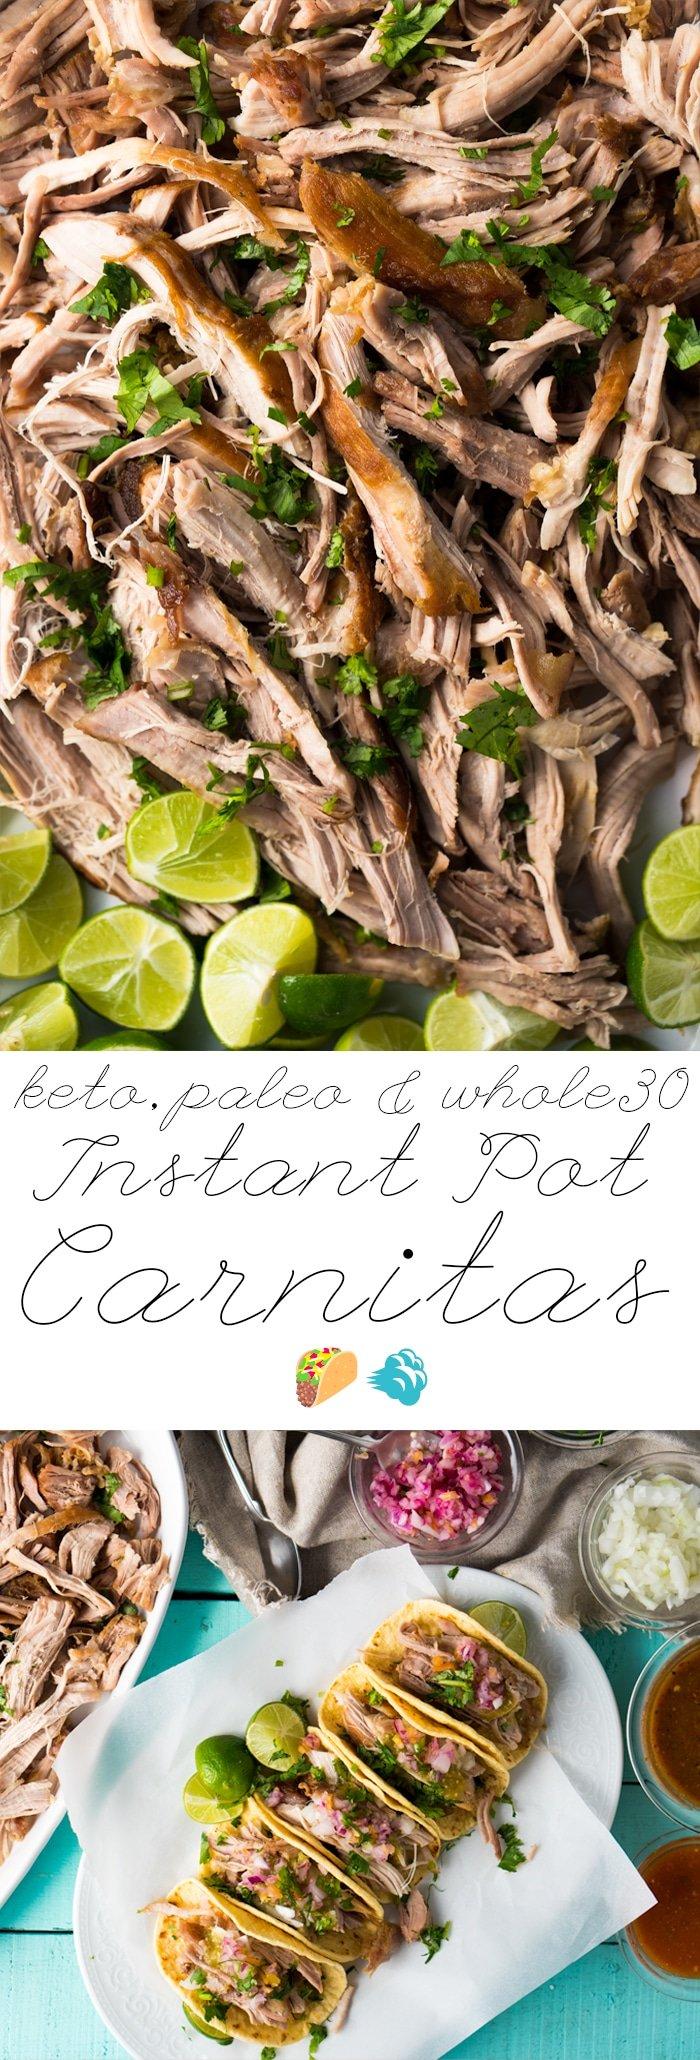 Paleo, Whole30 & Keto Instant Pot Carnitas🌮💨 #instantpotcarnitas #ketocarnitas